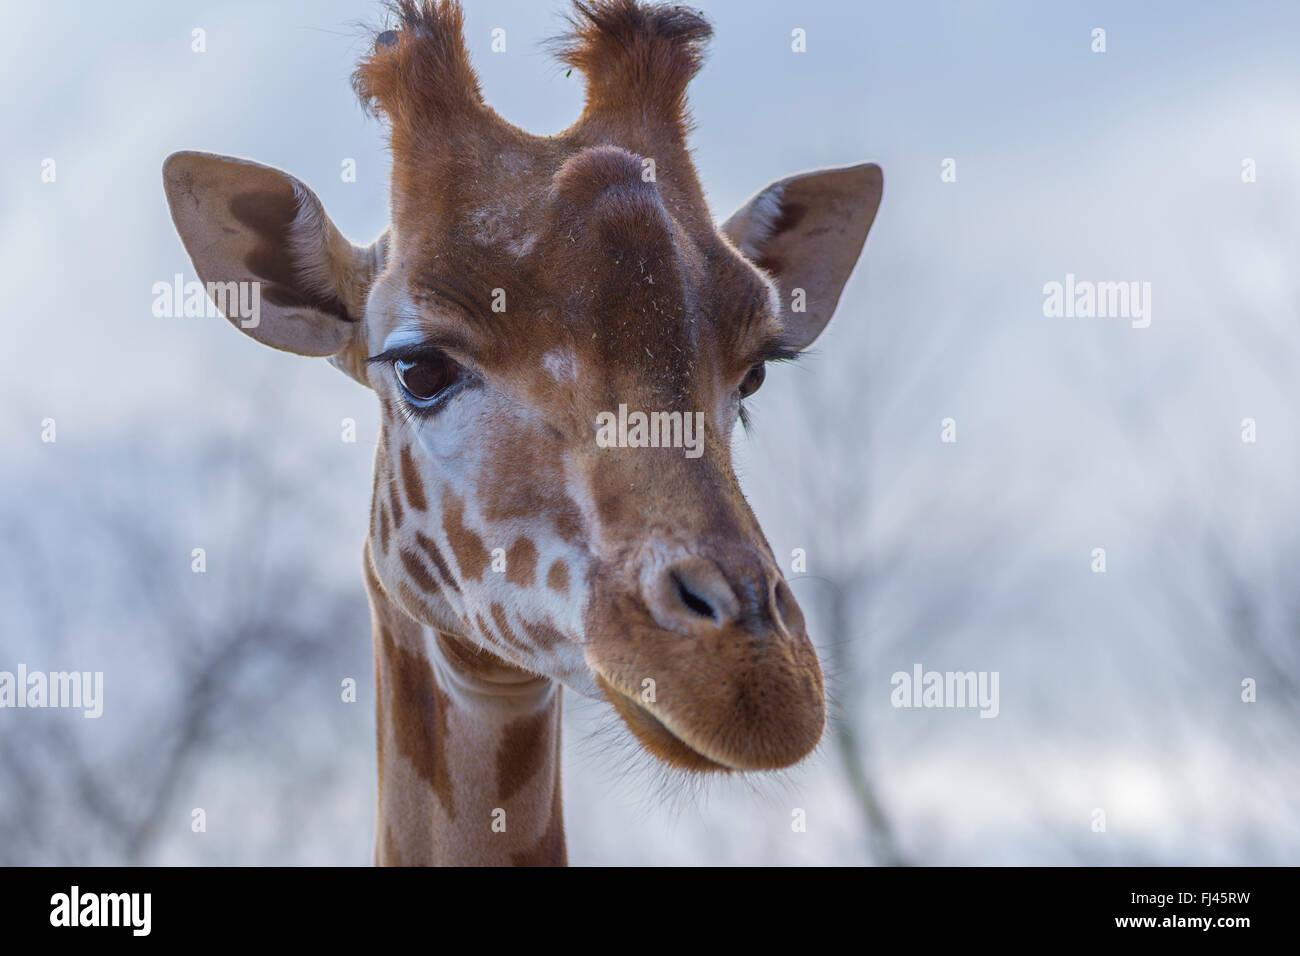 Eine Giraffe aus nächster Nähe Stockbild